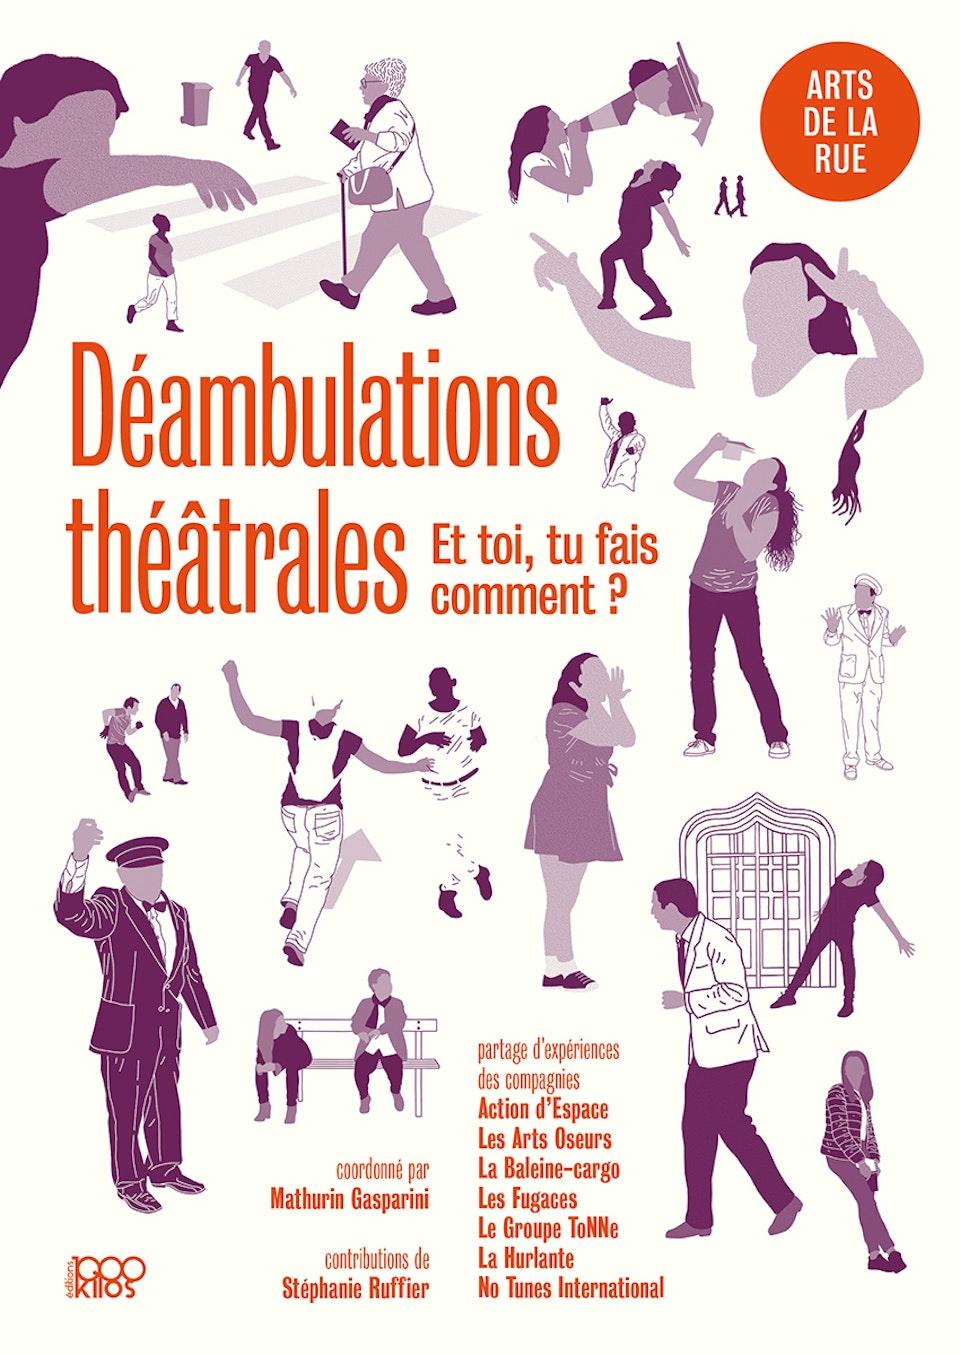 Déambulations théâtrales - Éditions 1000 Kilos [2020]